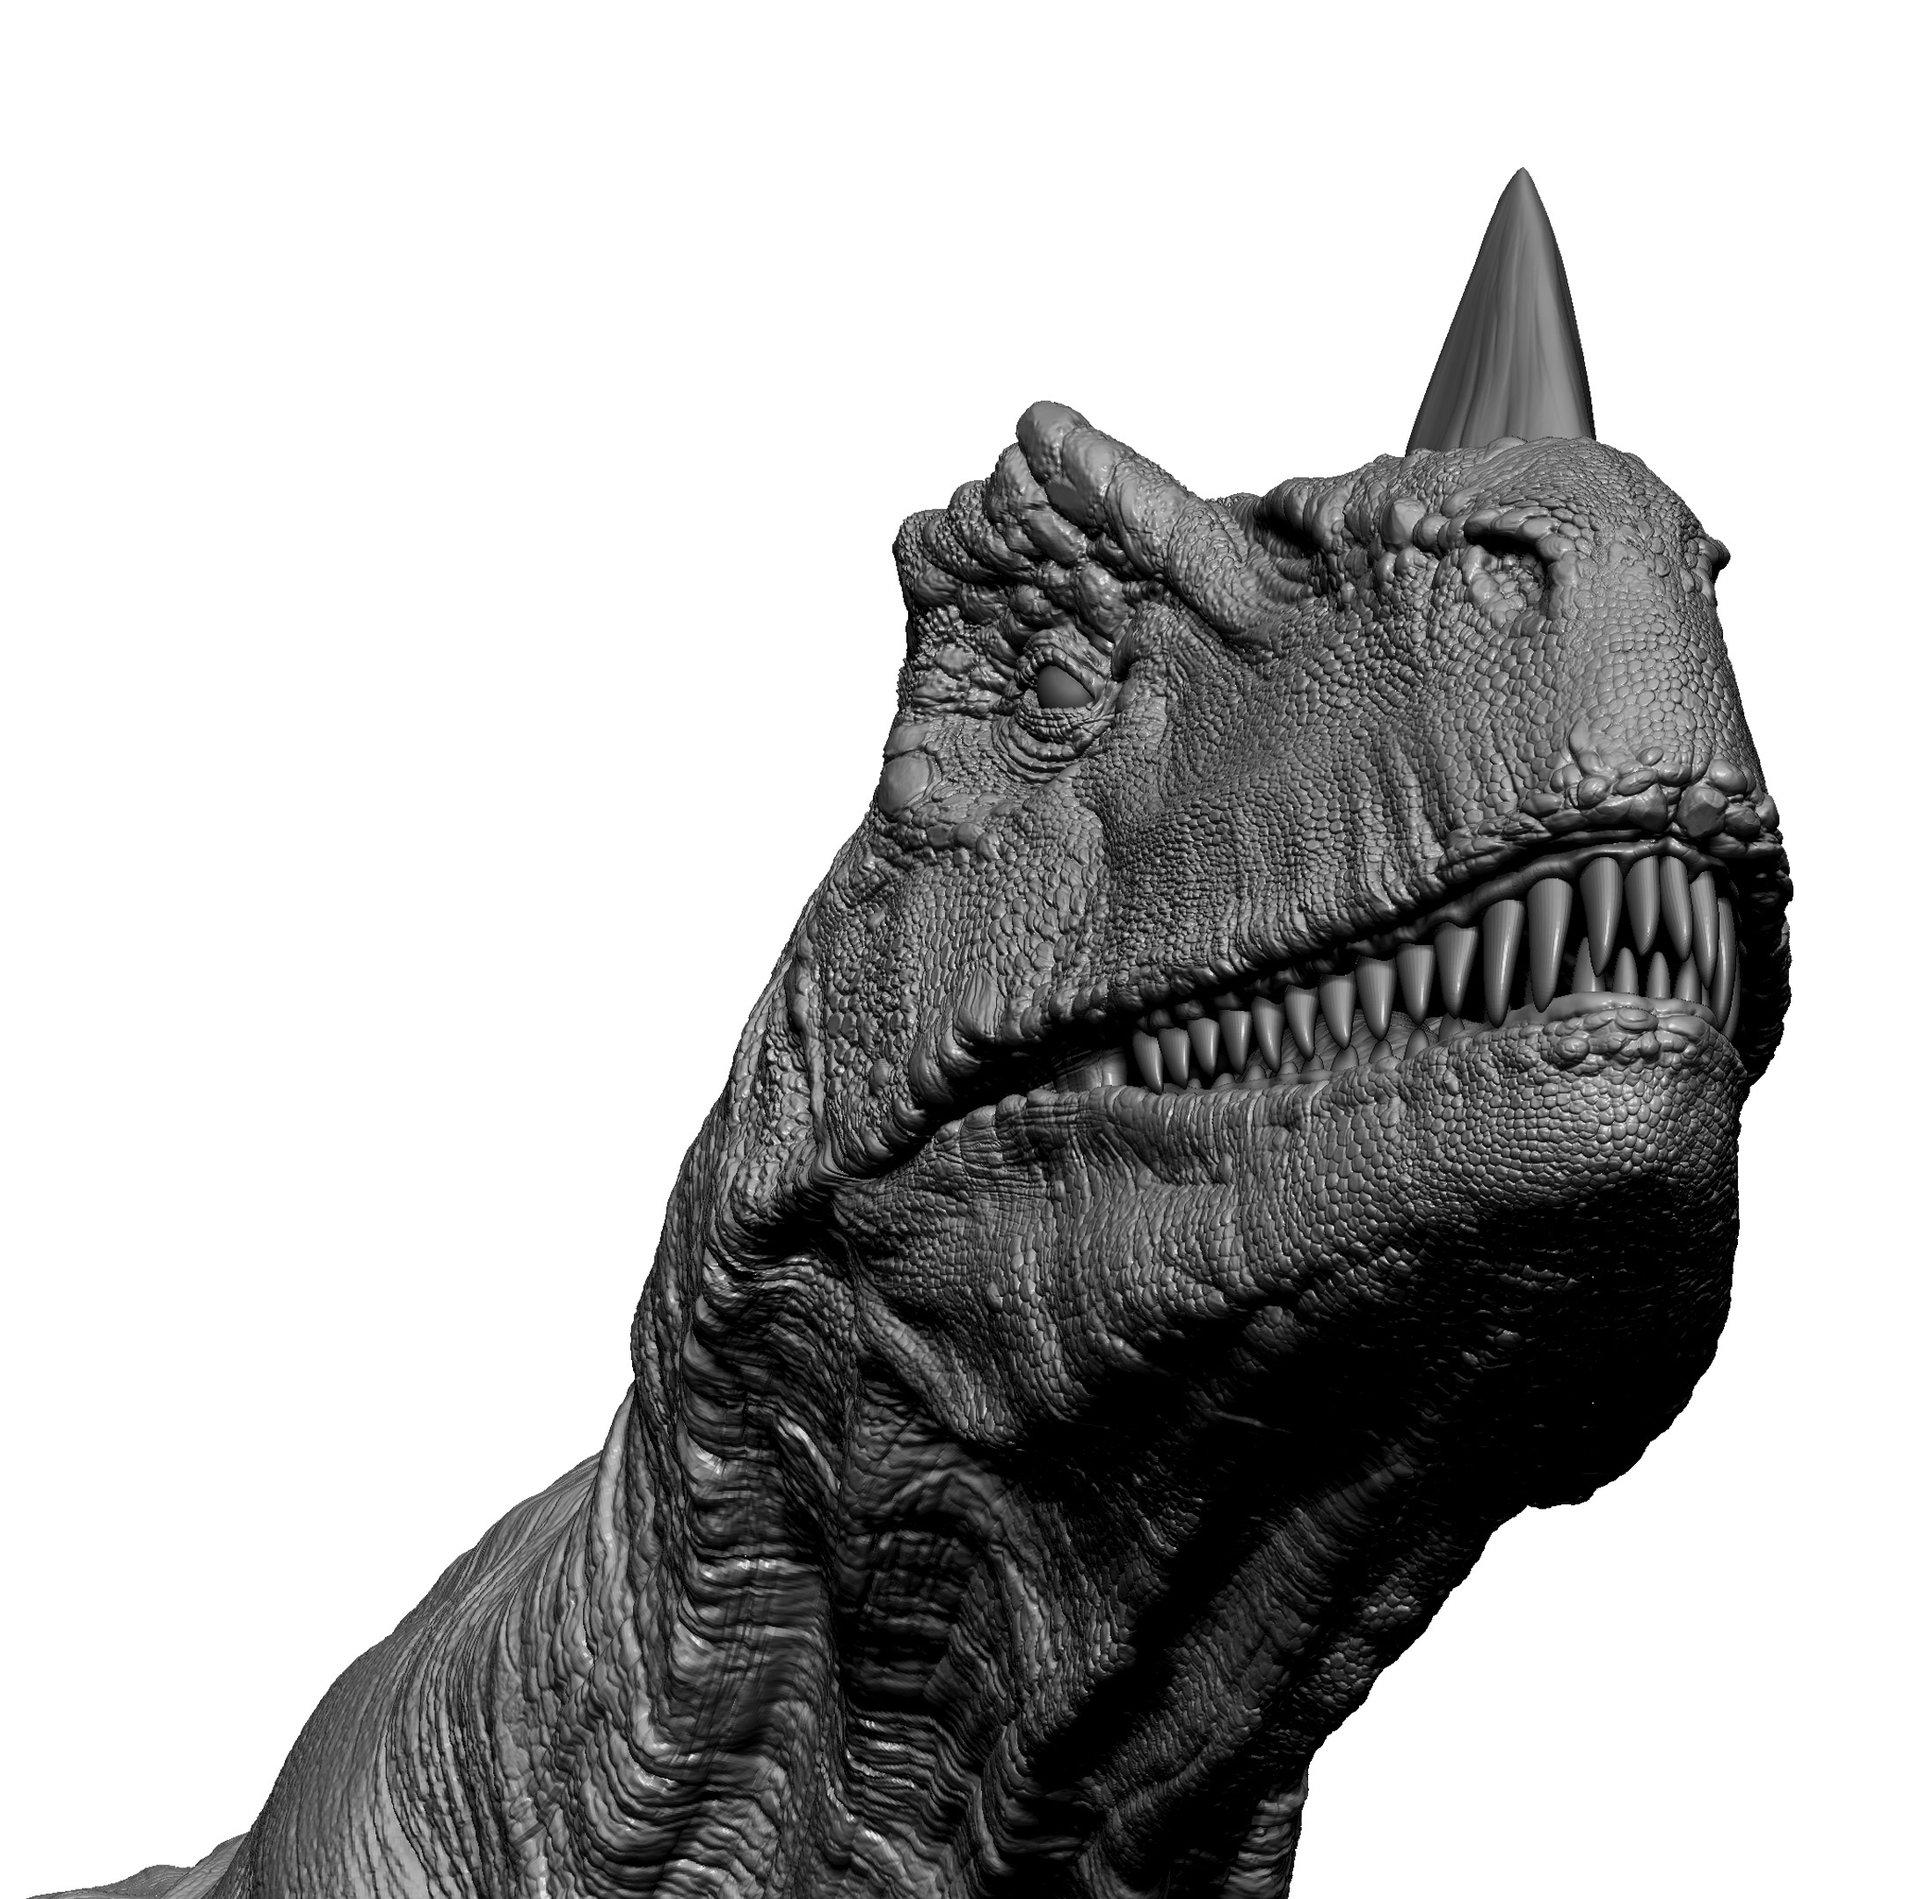 Jesse sandifer ceratosaurus1